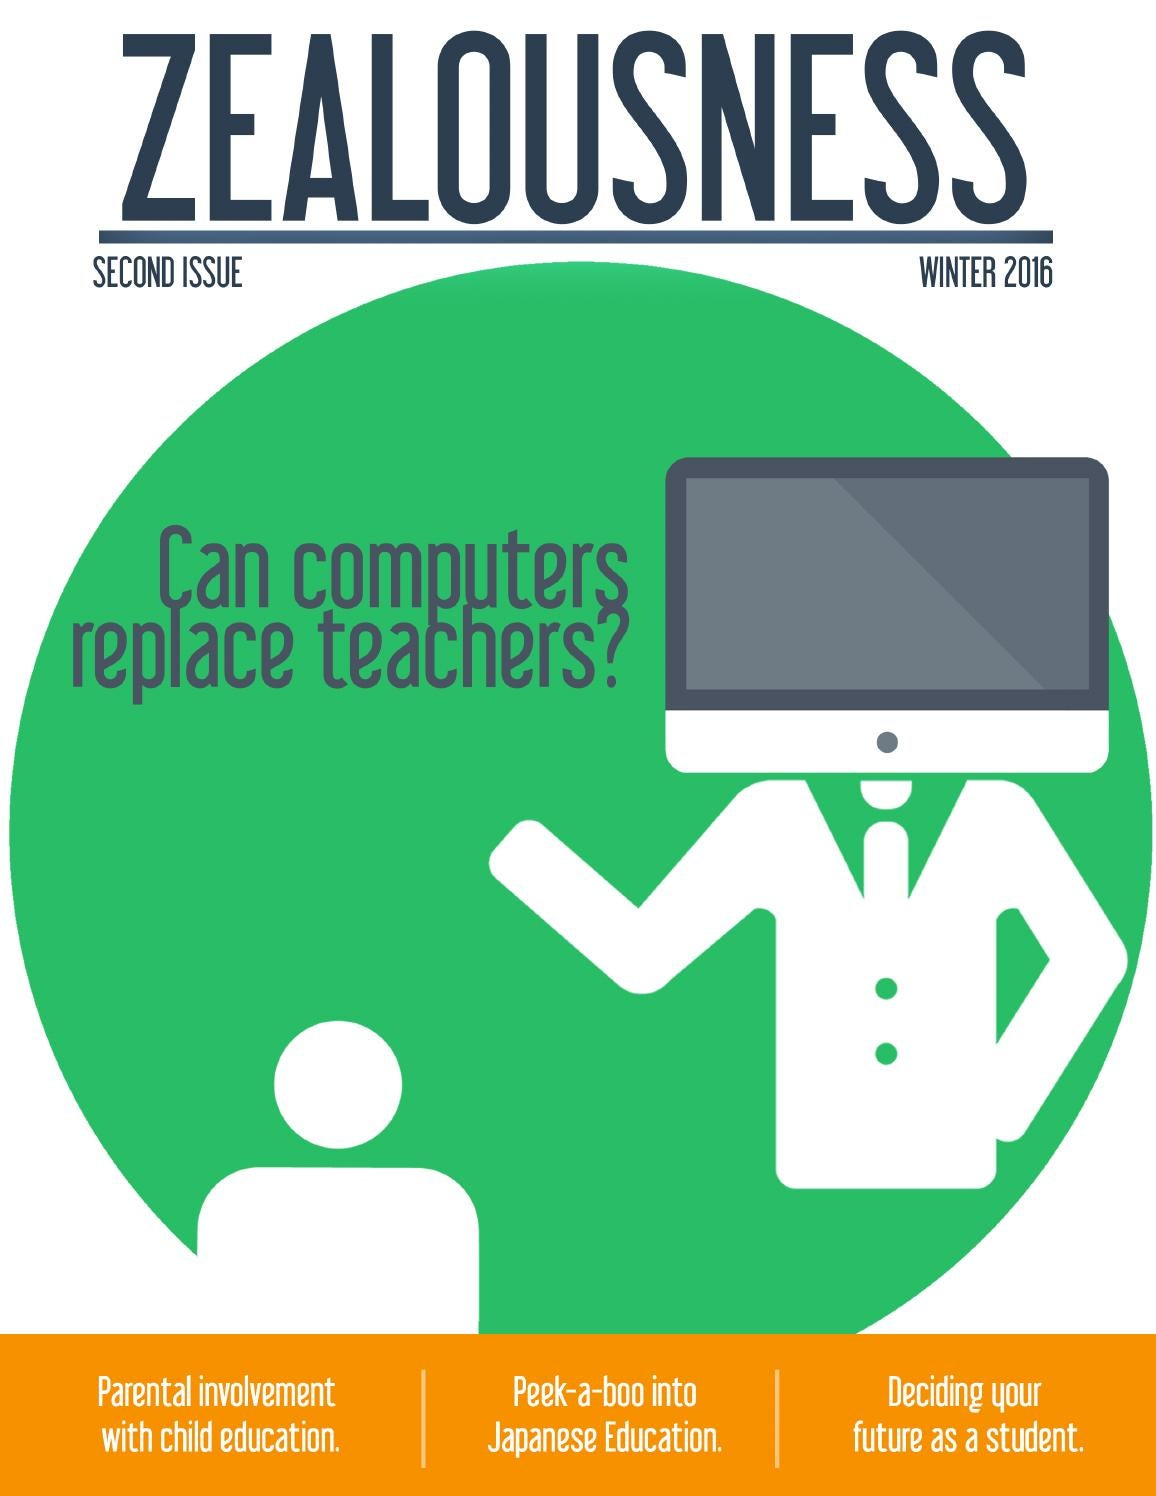 can computer replace teachers essay